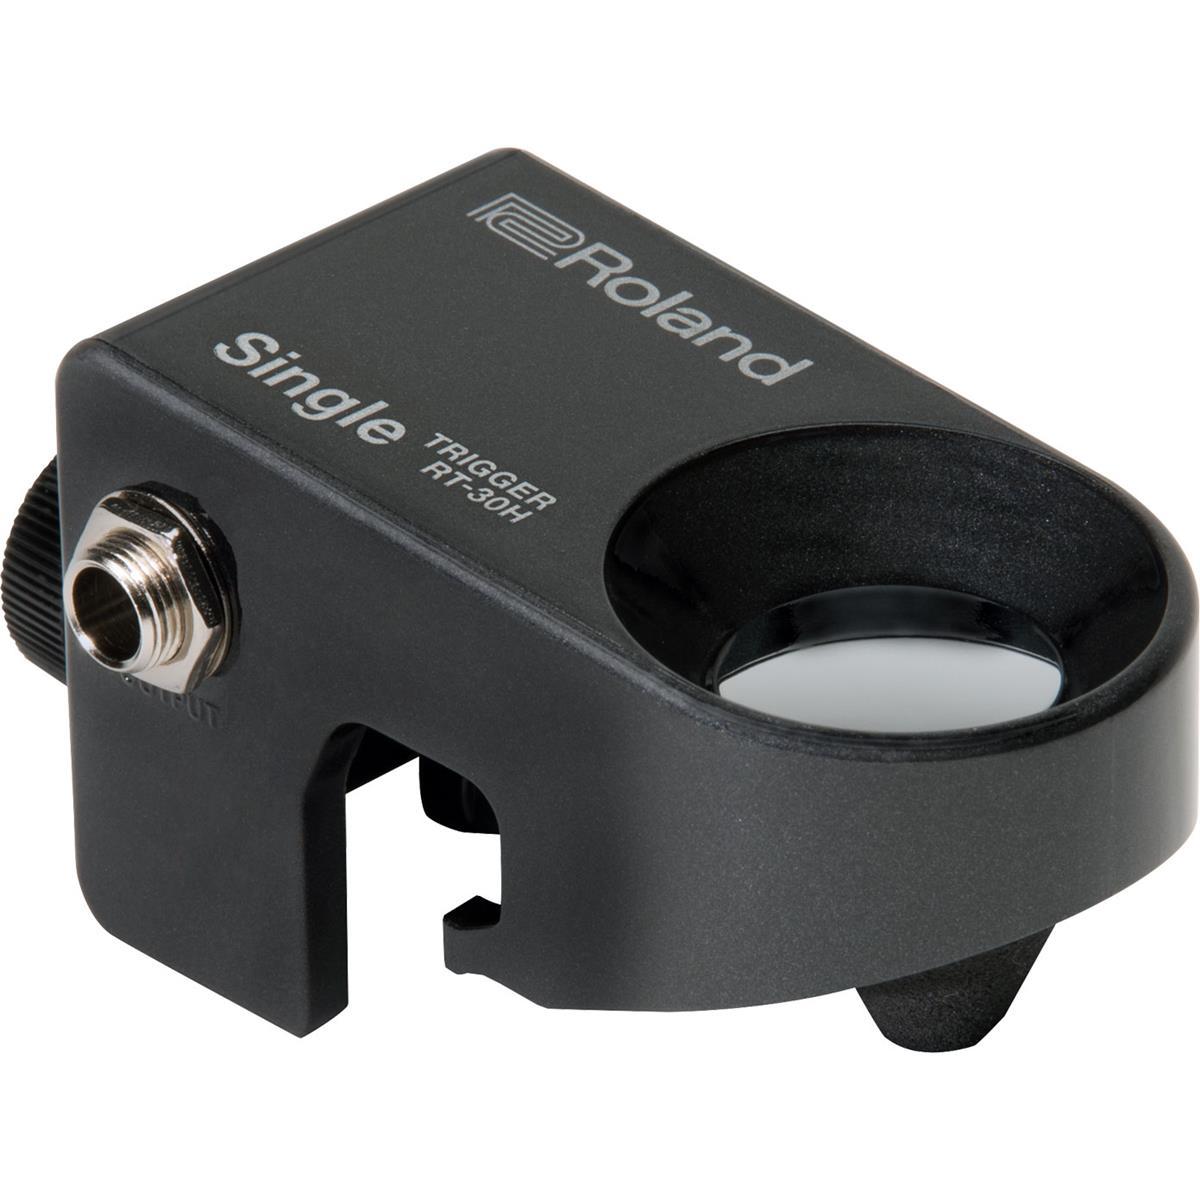 ROLAND-RT-30H-Head-Trigger-sku-14824